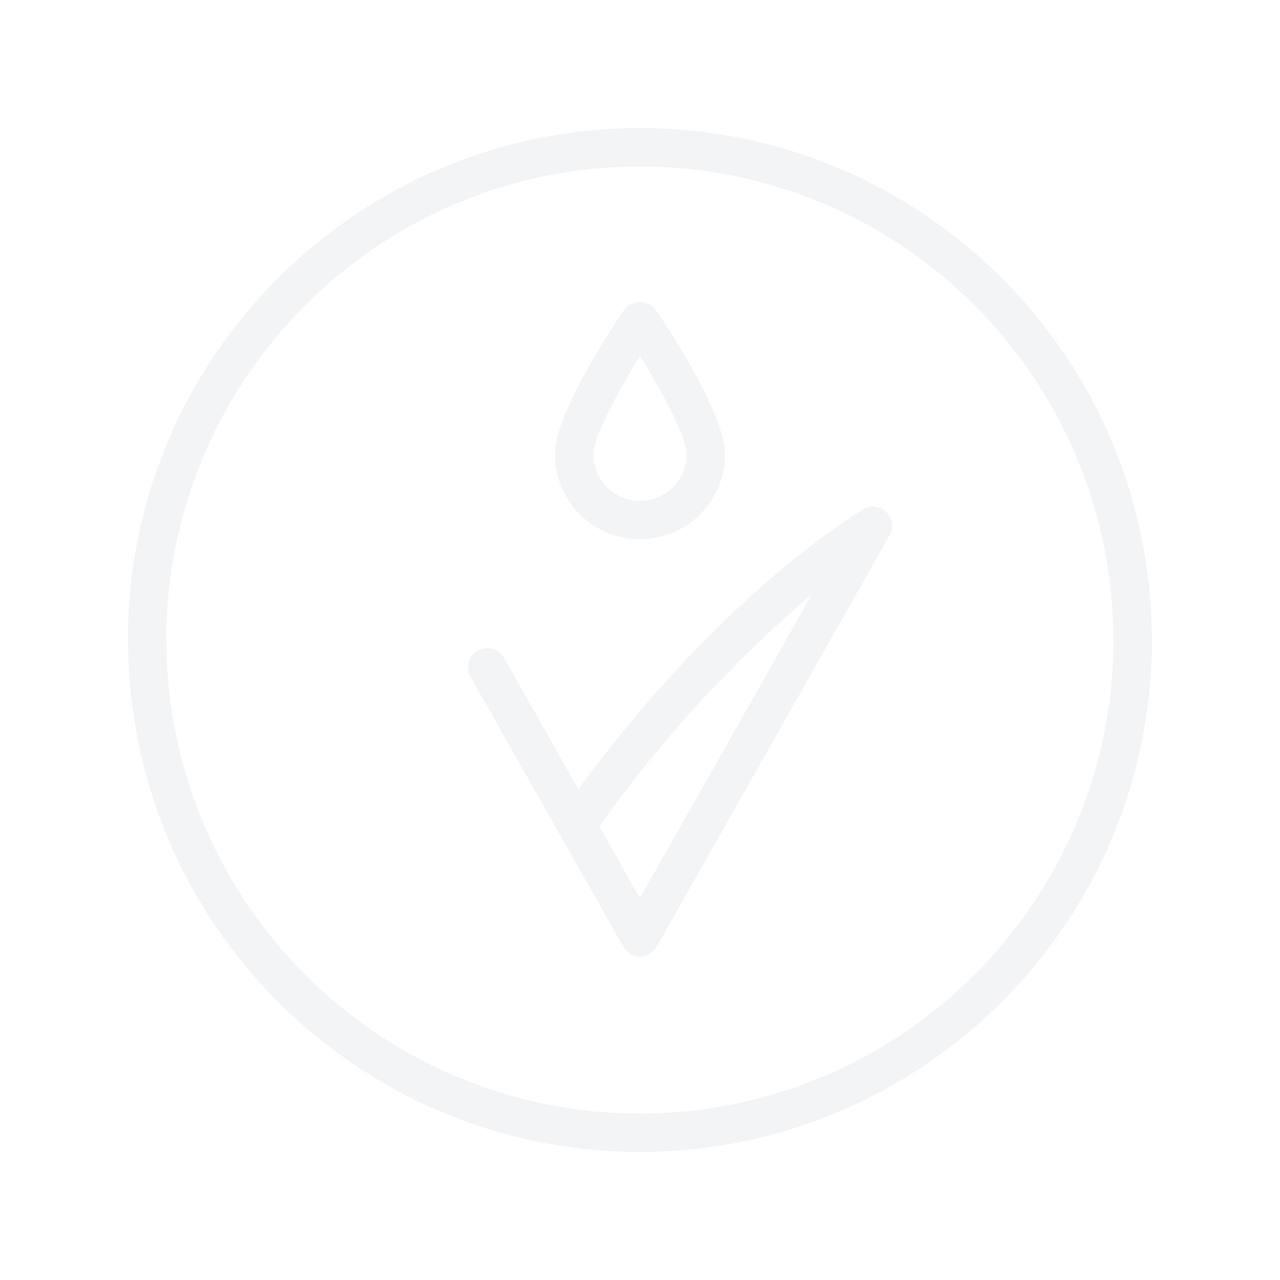 ARTDECO Bronzing Powder Compact Refill 10g